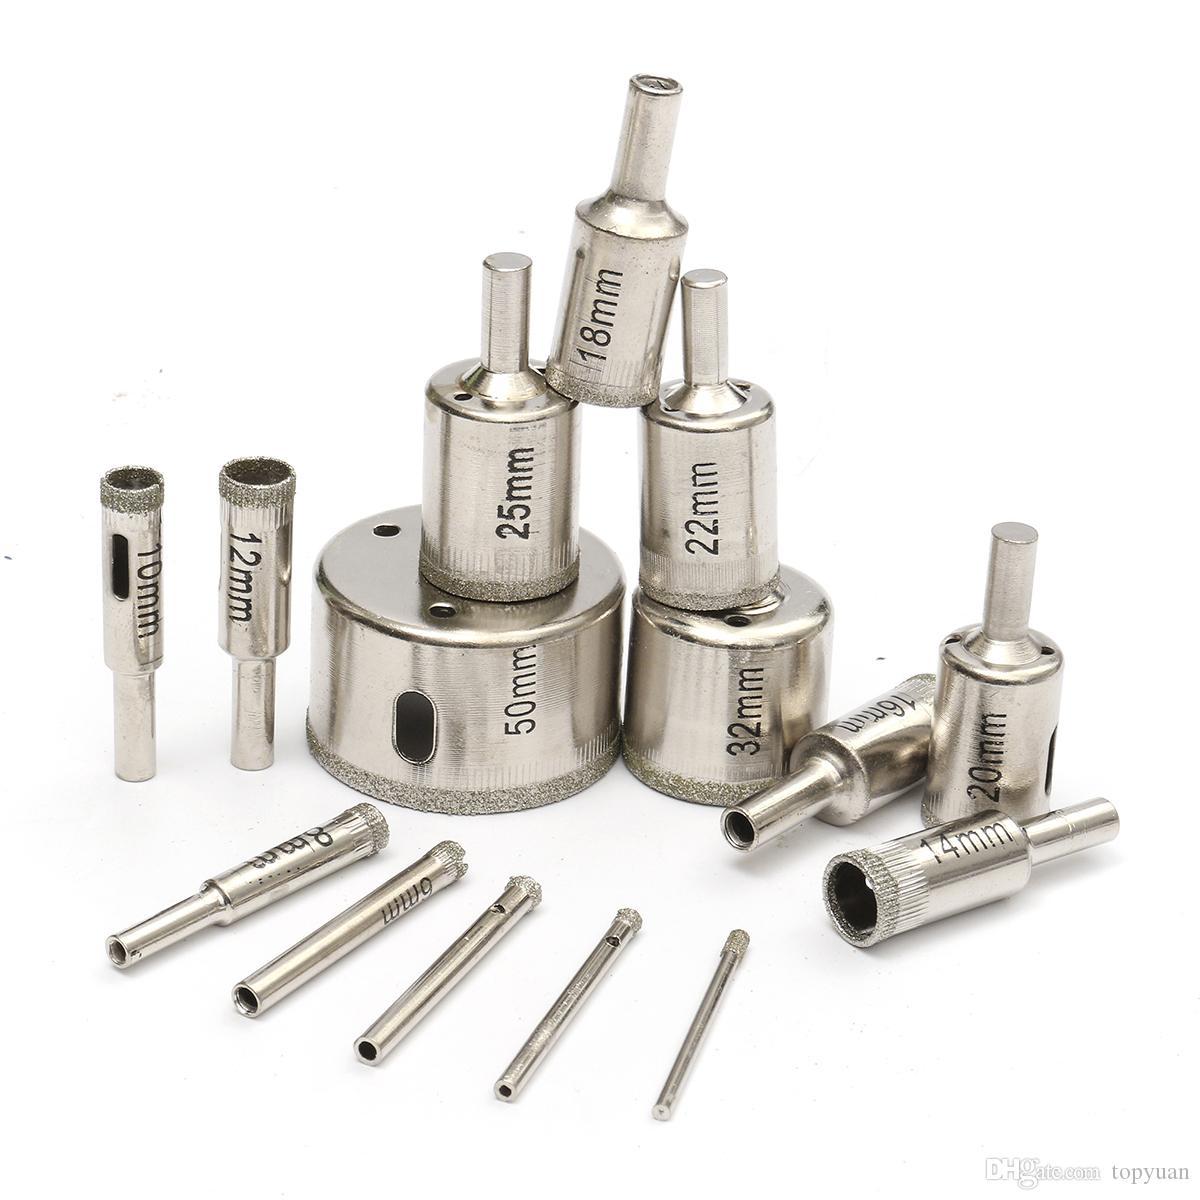 14 mm Cortador de sierra con orificio de diametro para baldosas de ceramica de vidrio